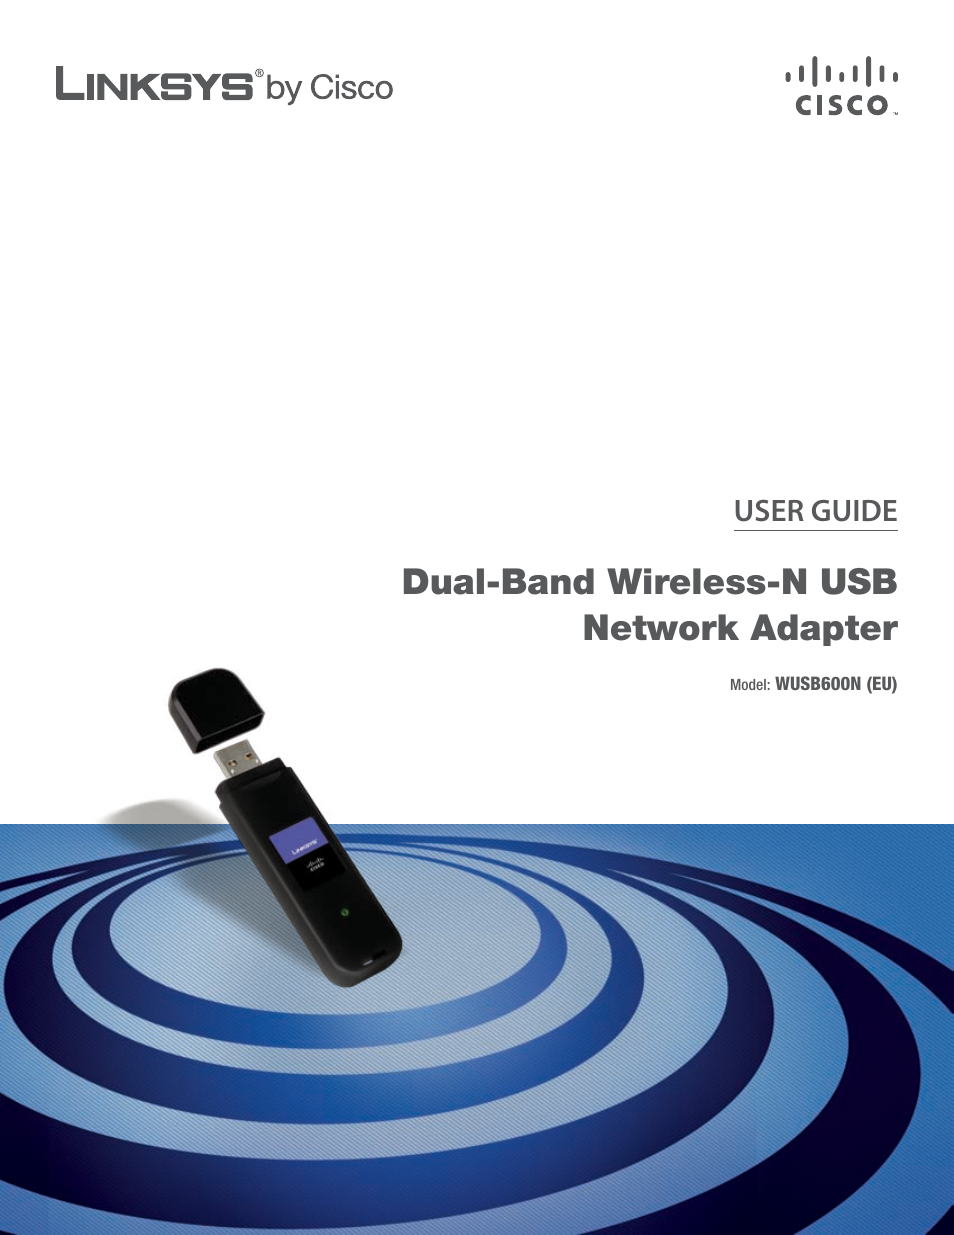 linksys dual band wireless n wusb600n user manual 53 pages rh manualsdir com Linksys WUSB600N Installation Software Linksys WUSB600N